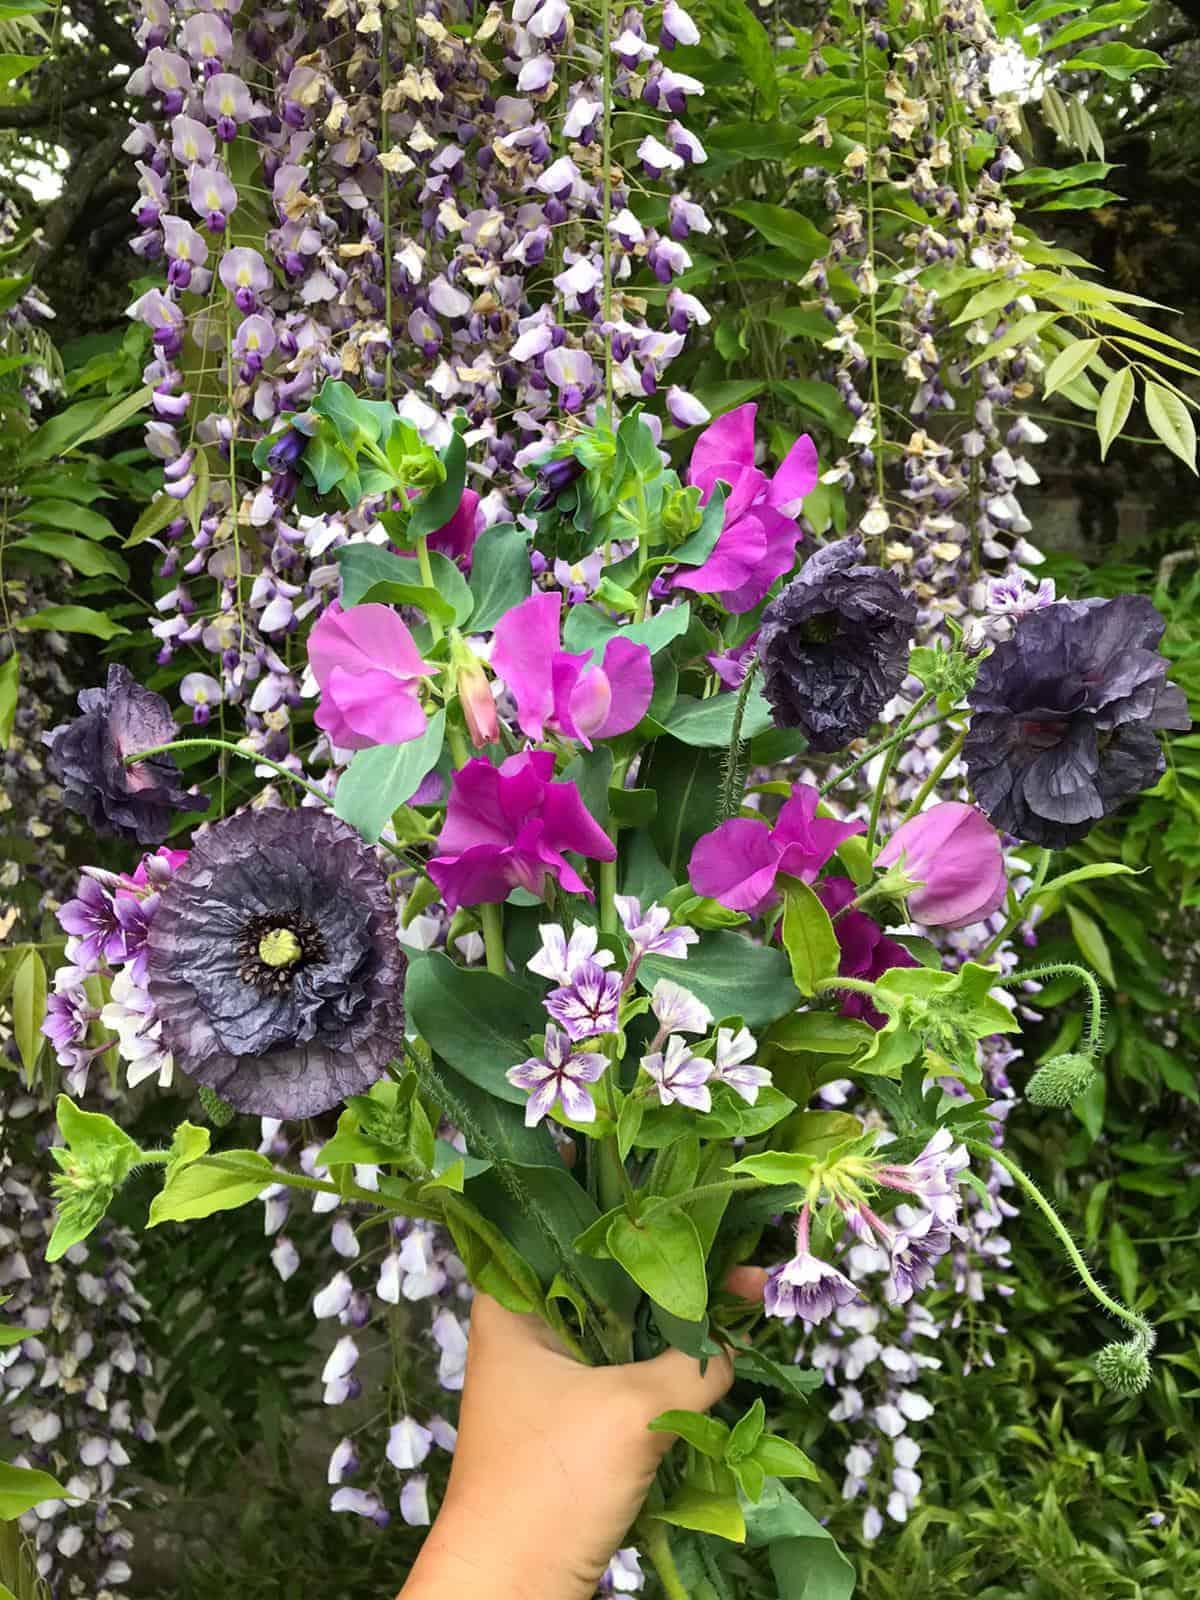 Fresh cut flowers from the Parham Garden